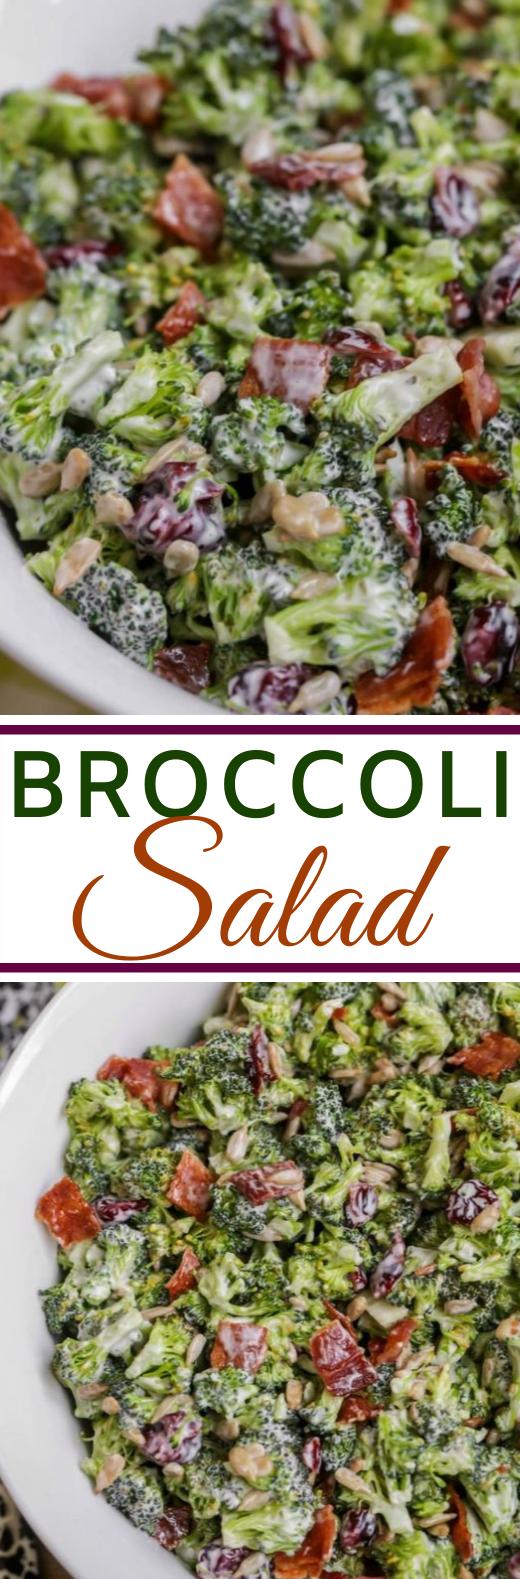 Broccoli Salad #healthy #salad #glutenfree #keto #lunch